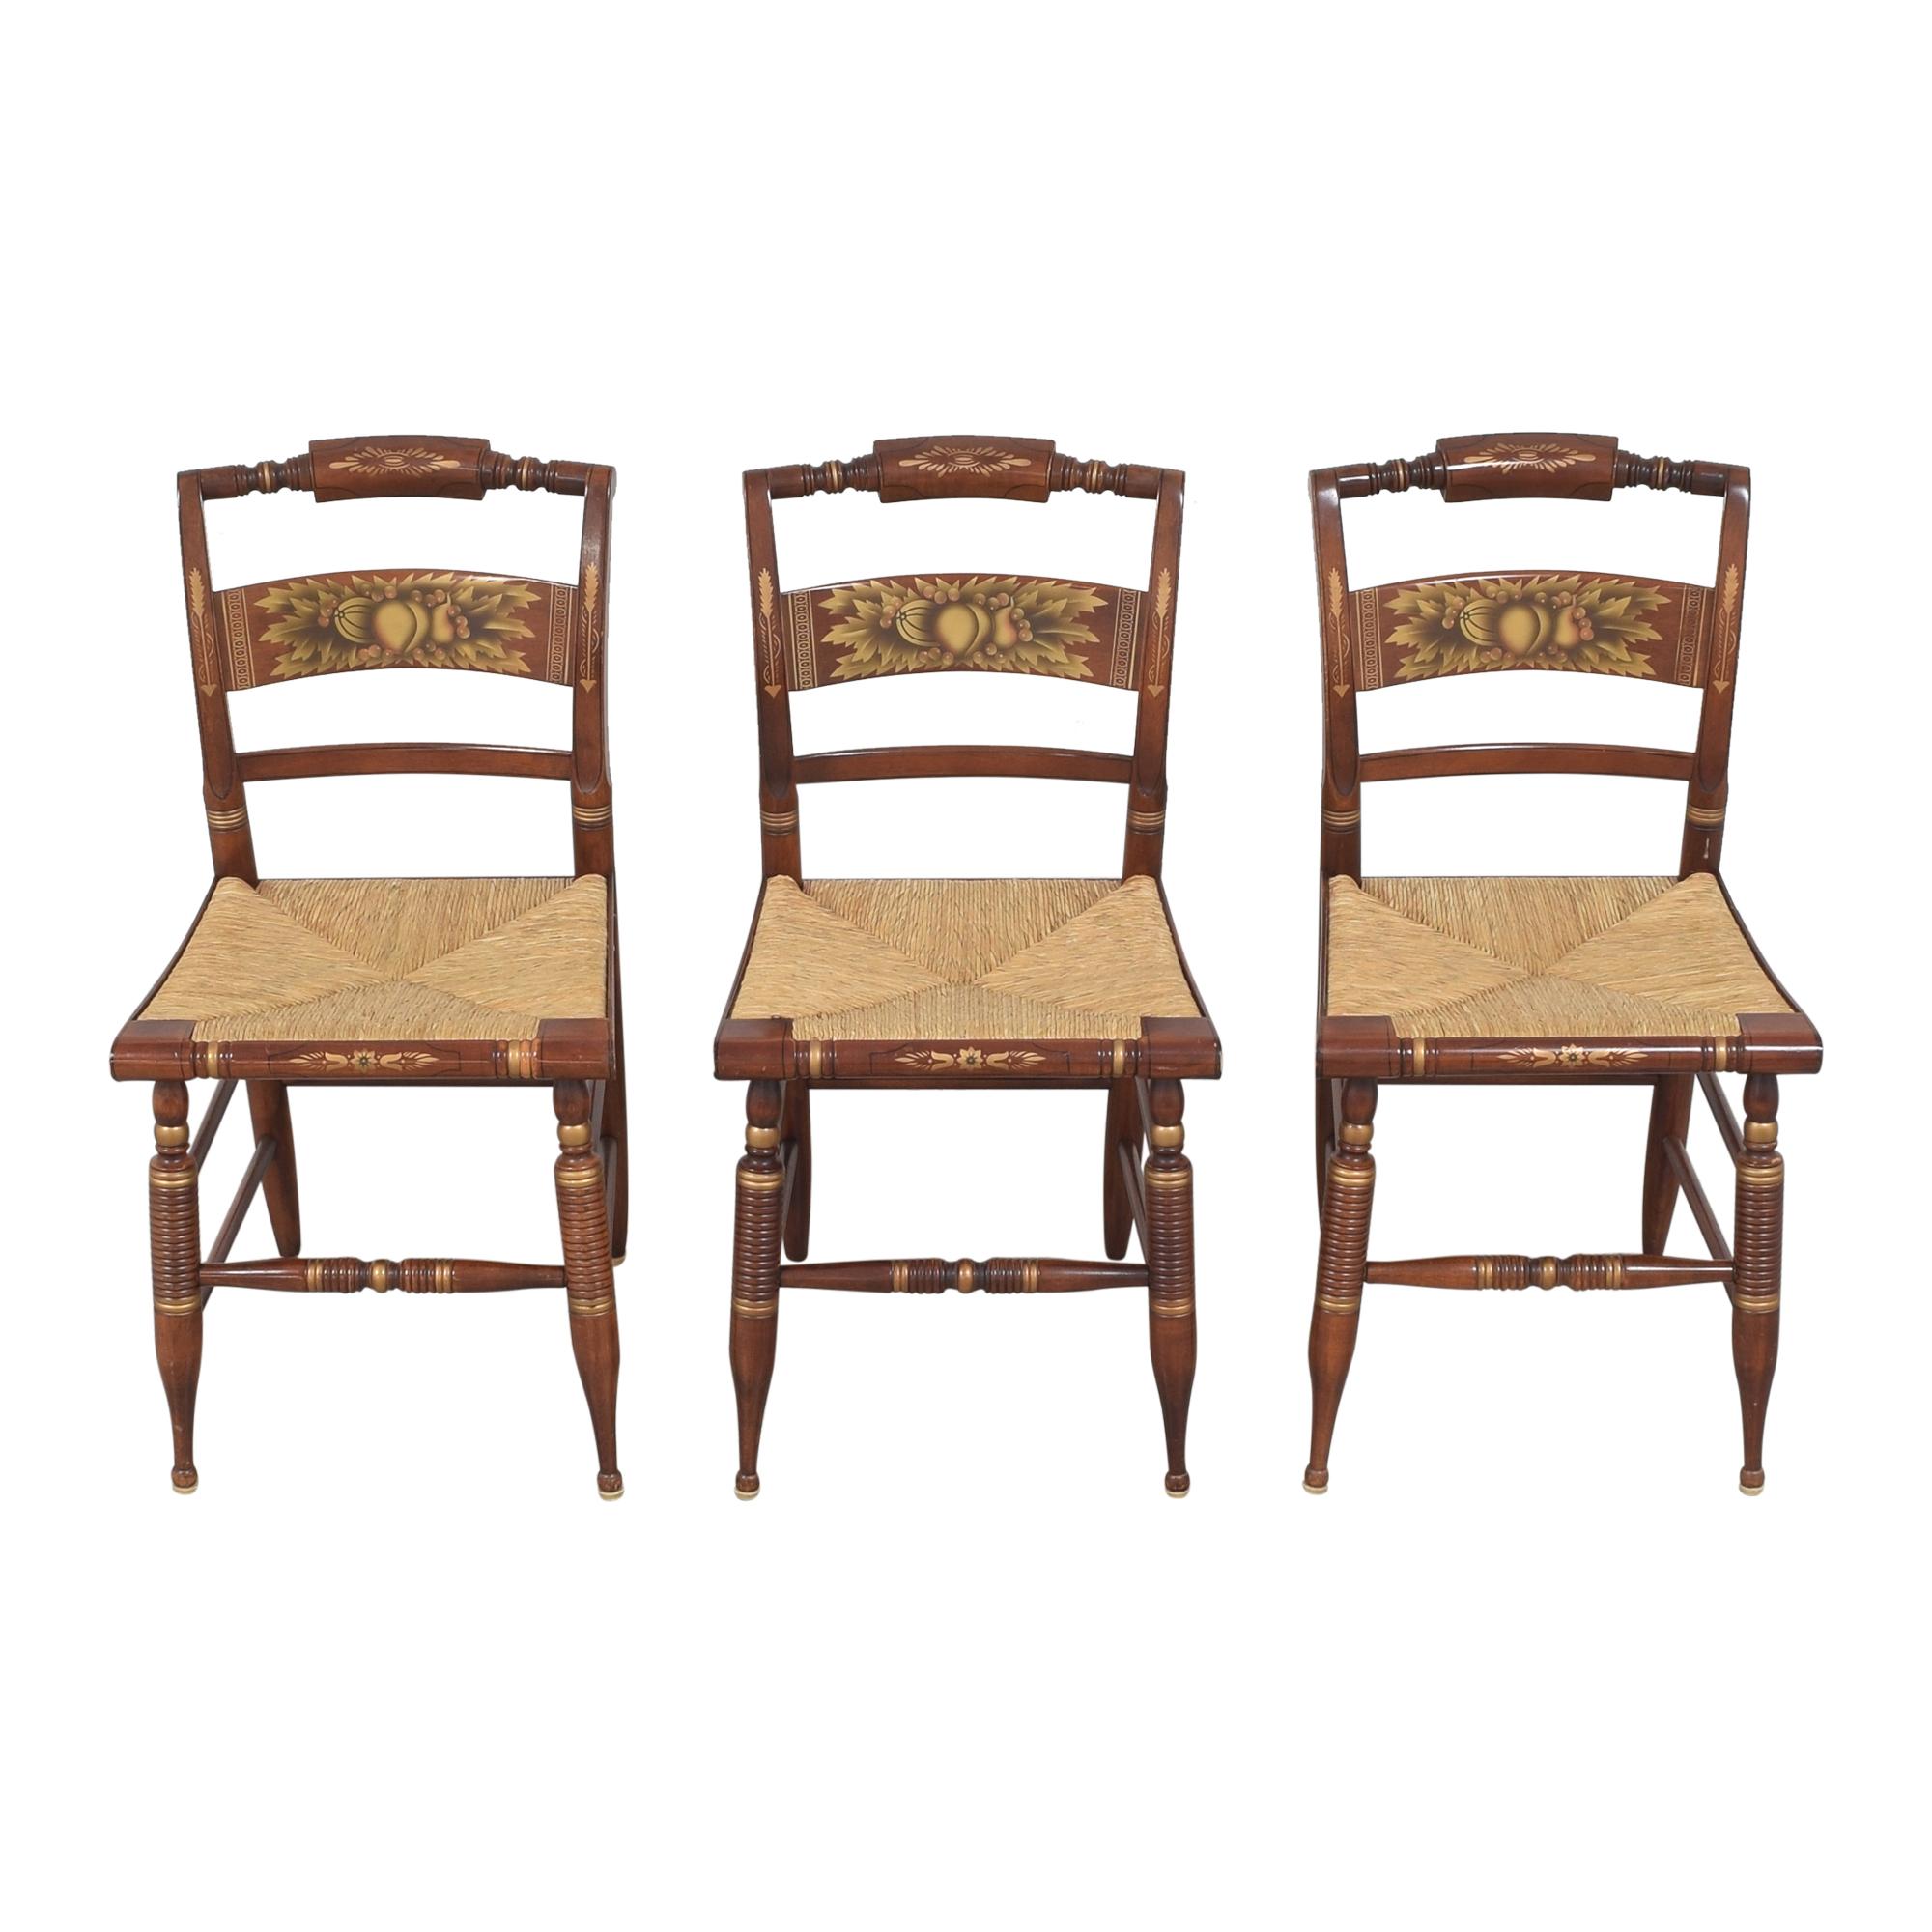 Lambert Hitchcock Lambert Hitchcock Cane Seat Dining Chairs second hand